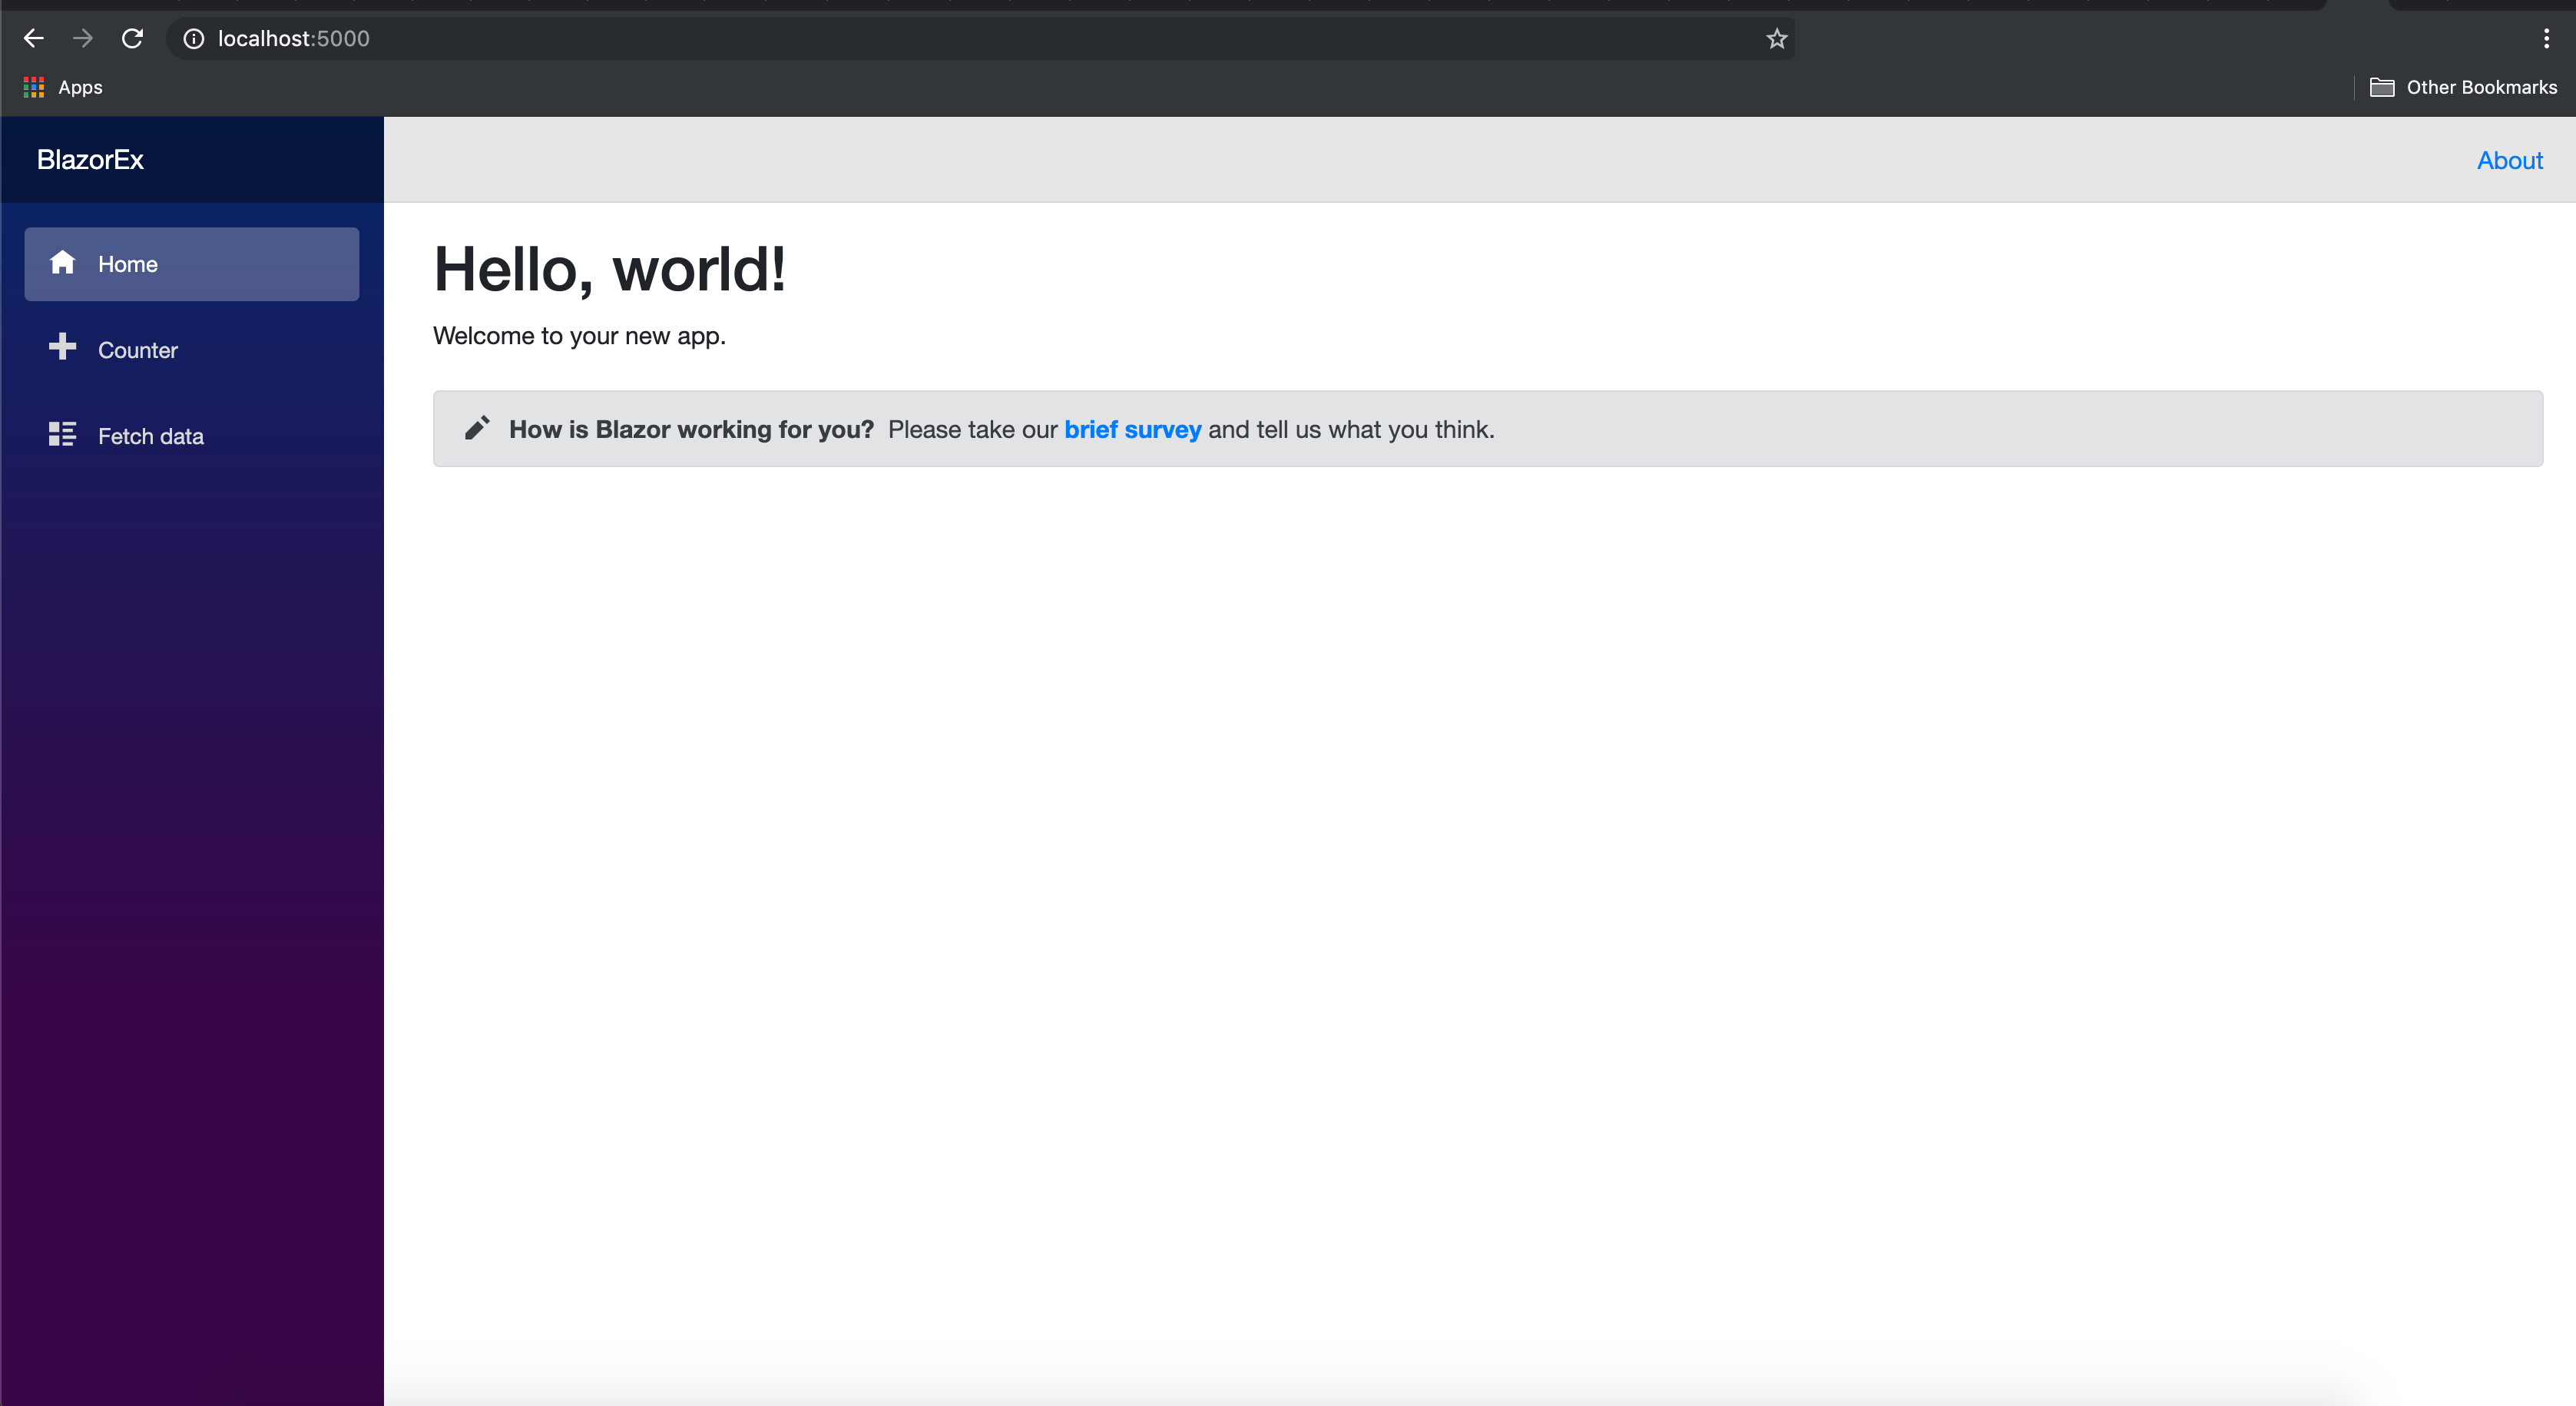 Homepage of Blazor Application